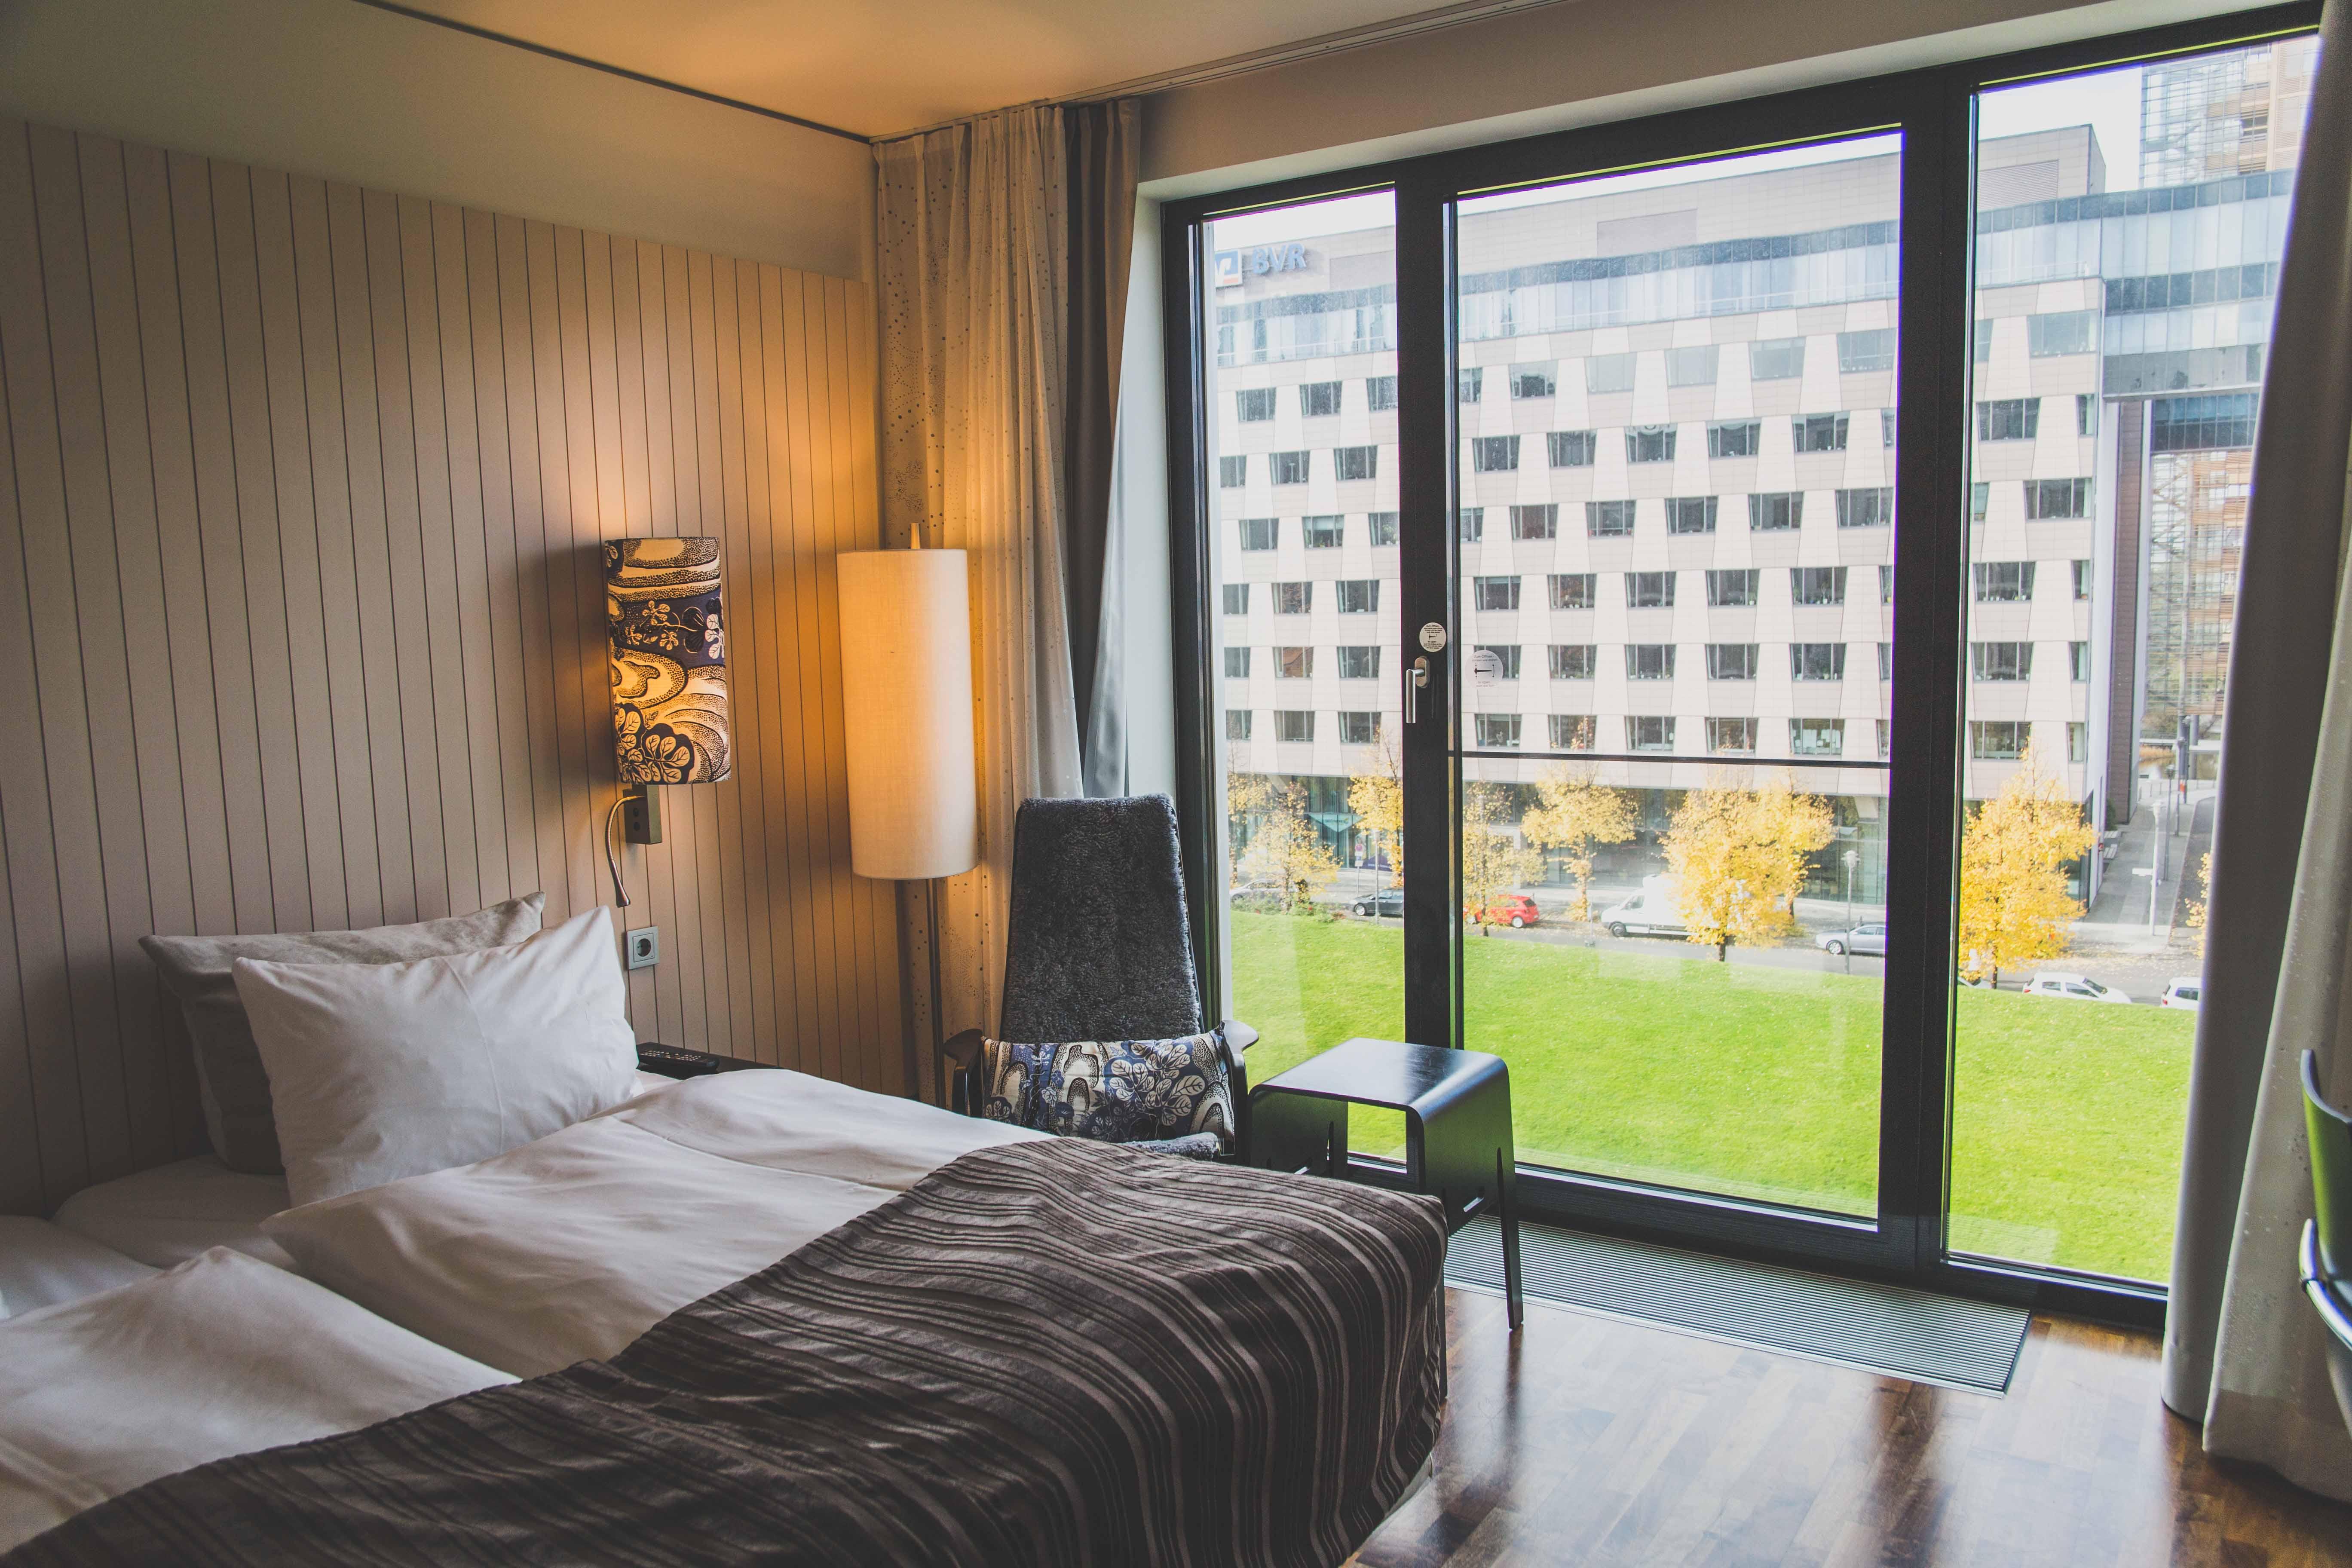 travel scandic hotel berlin rhyme ribbons. Black Bedroom Furniture Sets. Home Design Ideas